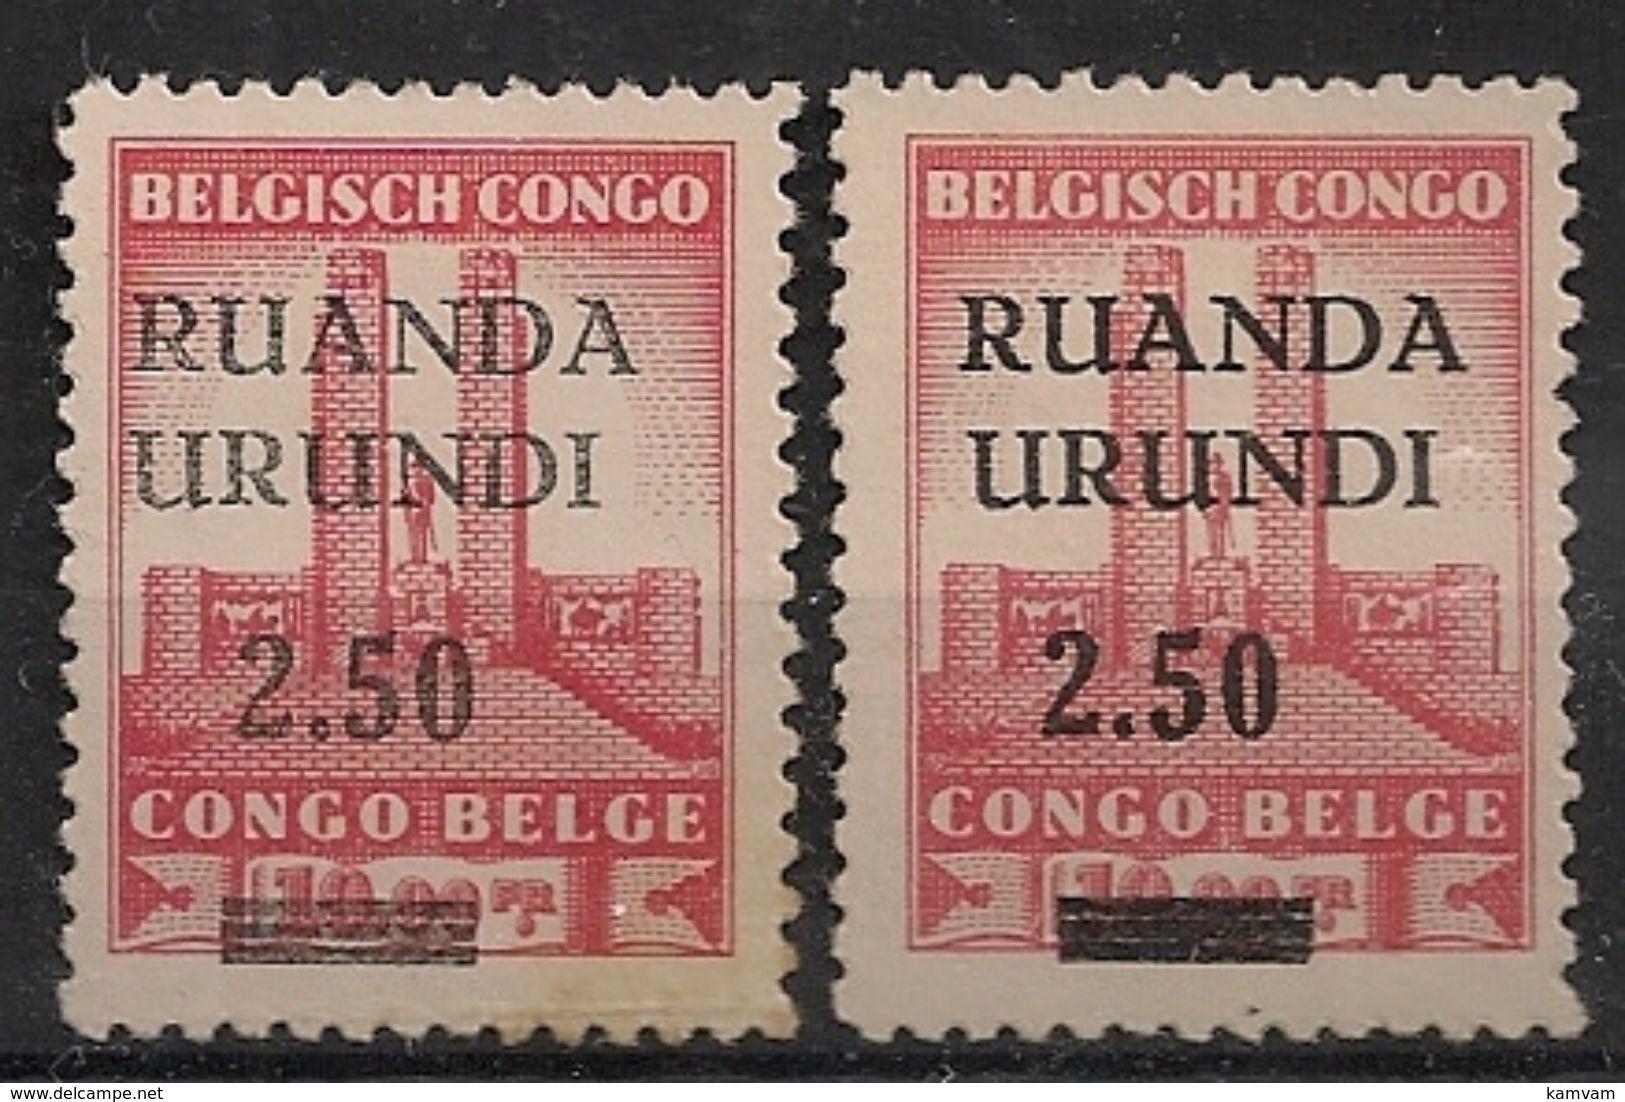 RUANDA URUNDI 120 2 Types : U Onder R + Verschoven Durk / U Sous R + Impressio Décalé MH Mint * - 1916-22: Mint/hinged